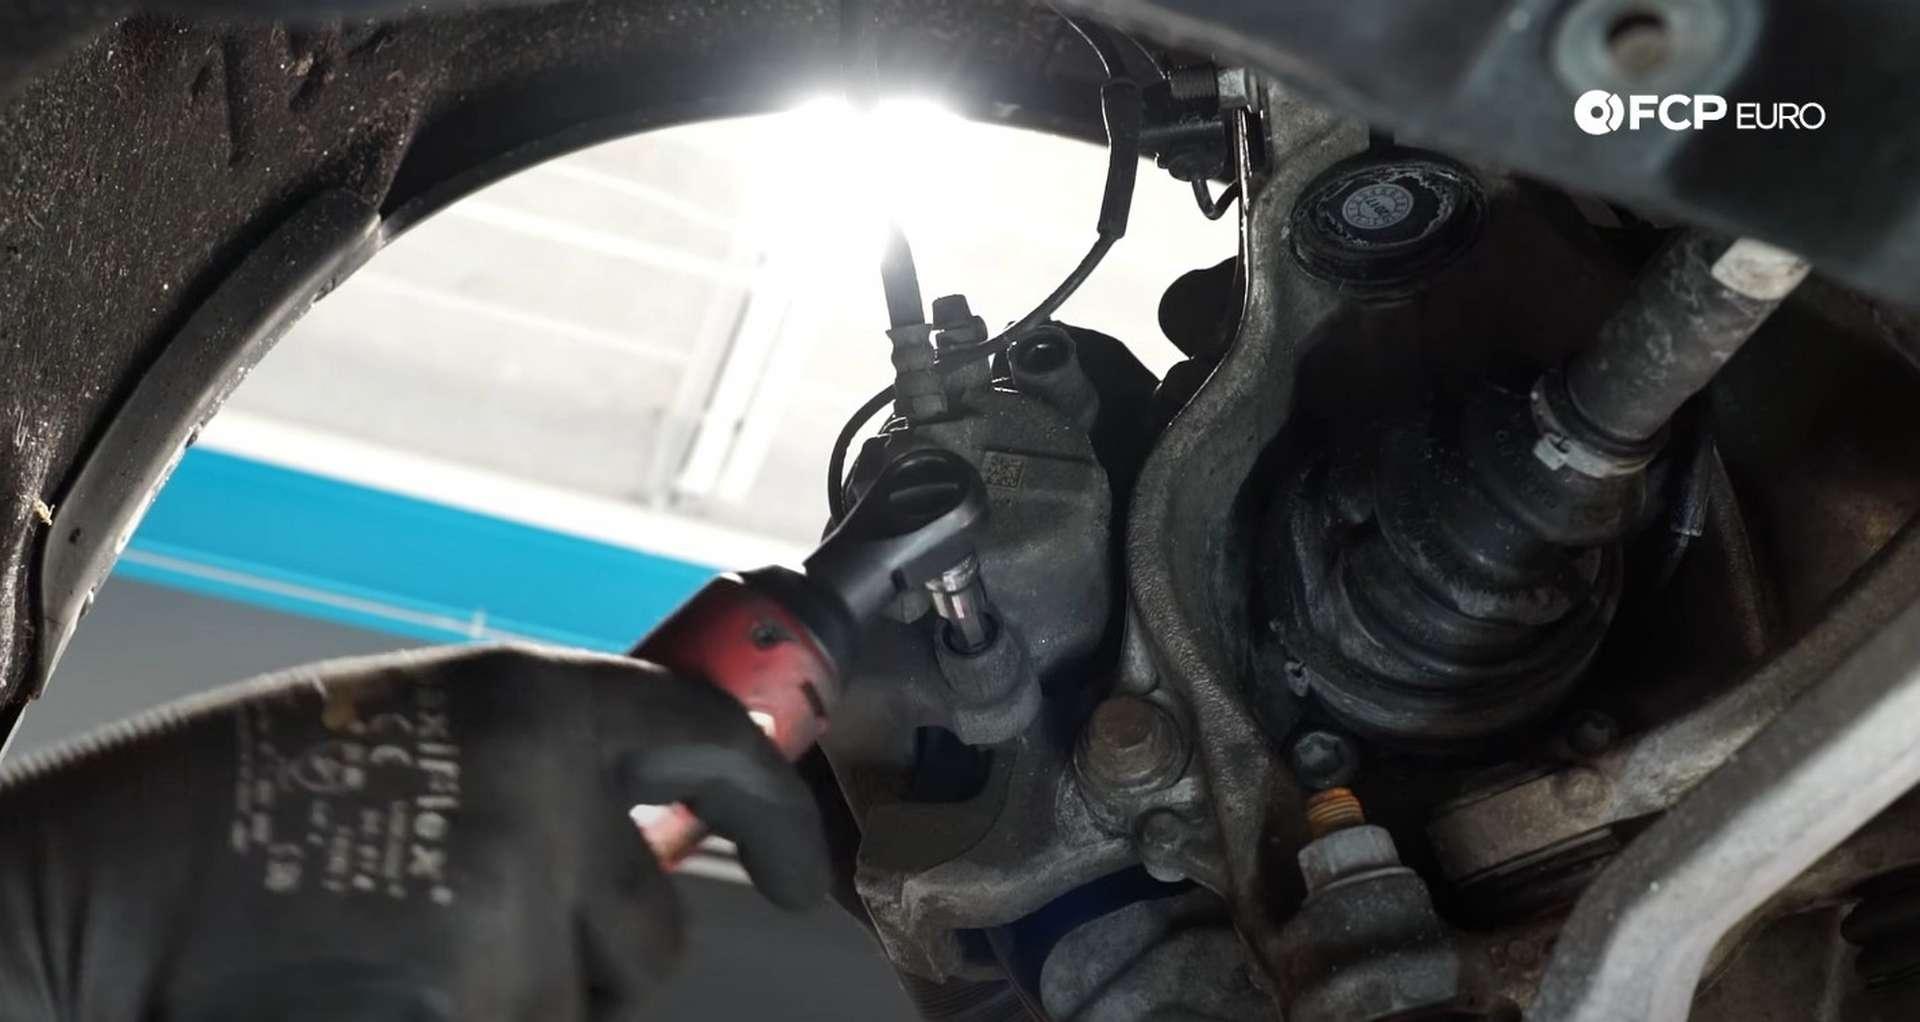 04-DIY-BMW-F30-Front-Brake-Service_Removing-The-Caliper